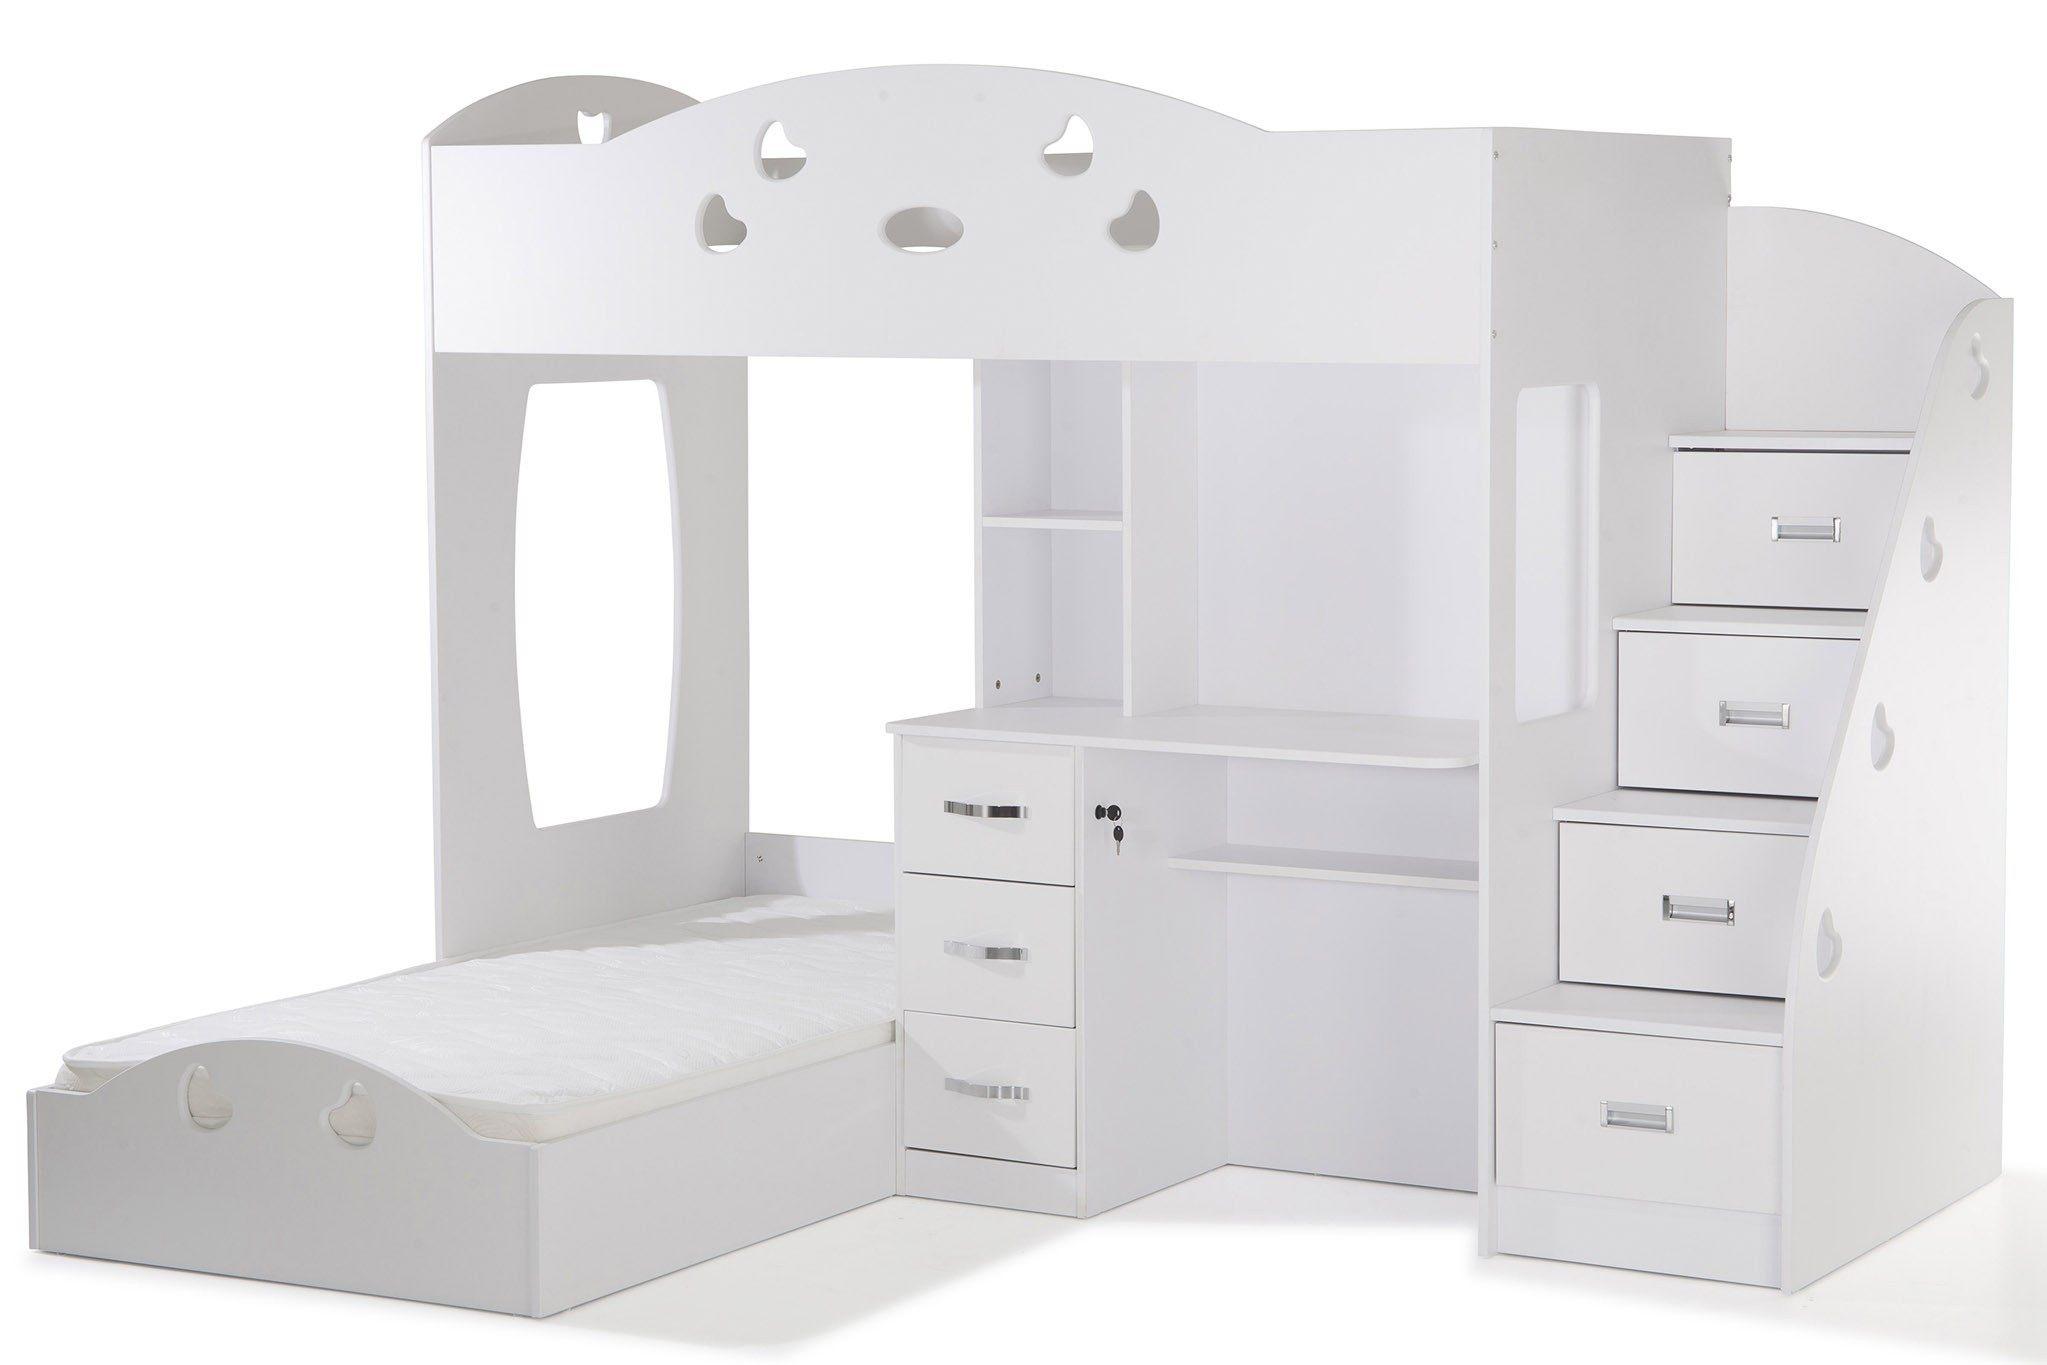 Lit Combiné Bureau Ikea Le Luxe Intéressant Lit Biné Armoire Bureau  Lit Biné Armoire Fresh Lit